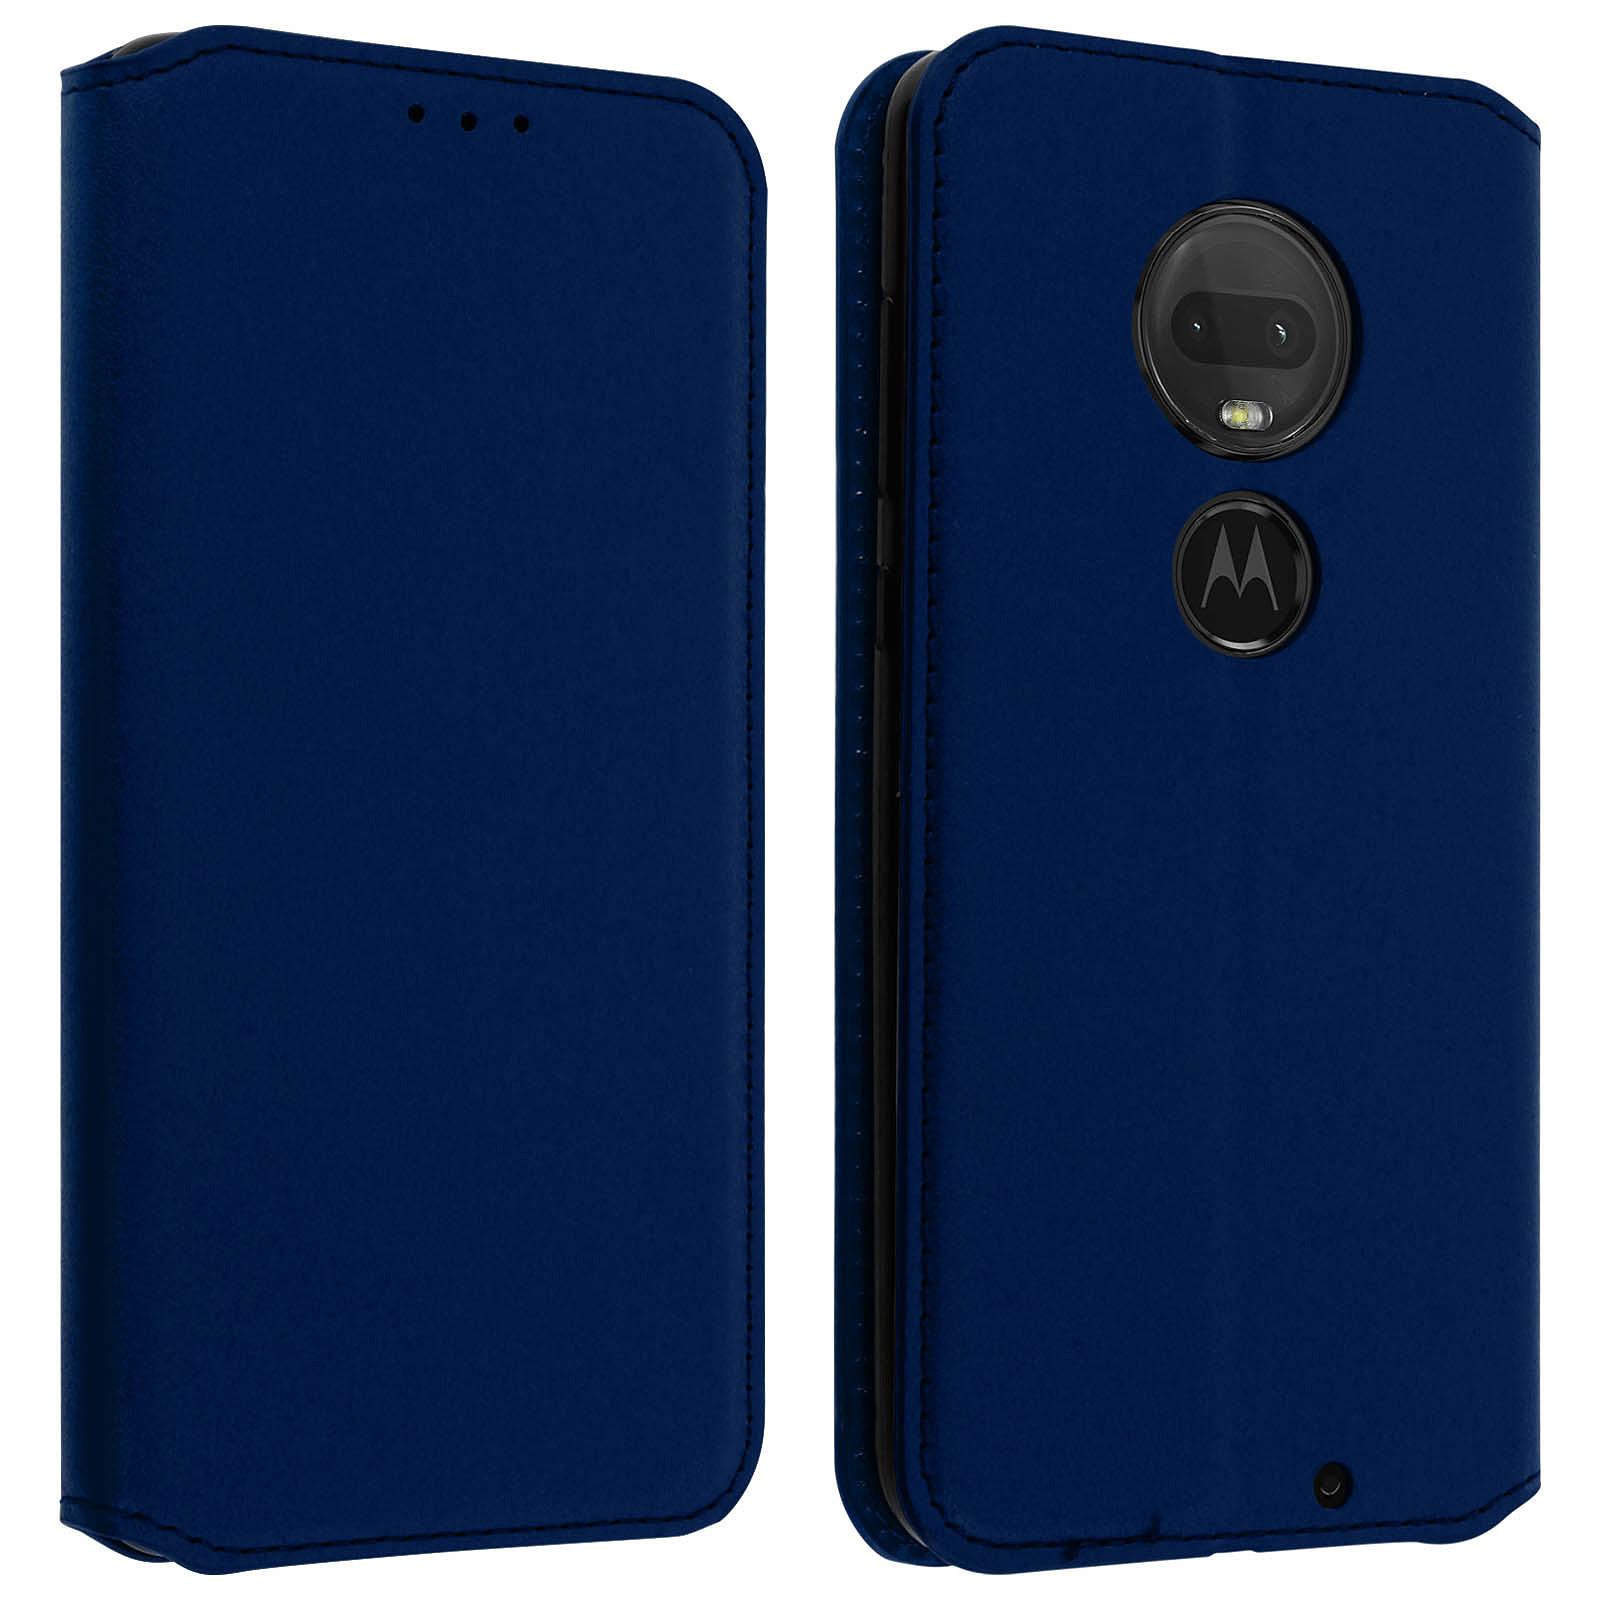 Avizar Etui folio Bleu Nuit pour Motorola Moto G7 , Motorola Moto G7 Plus